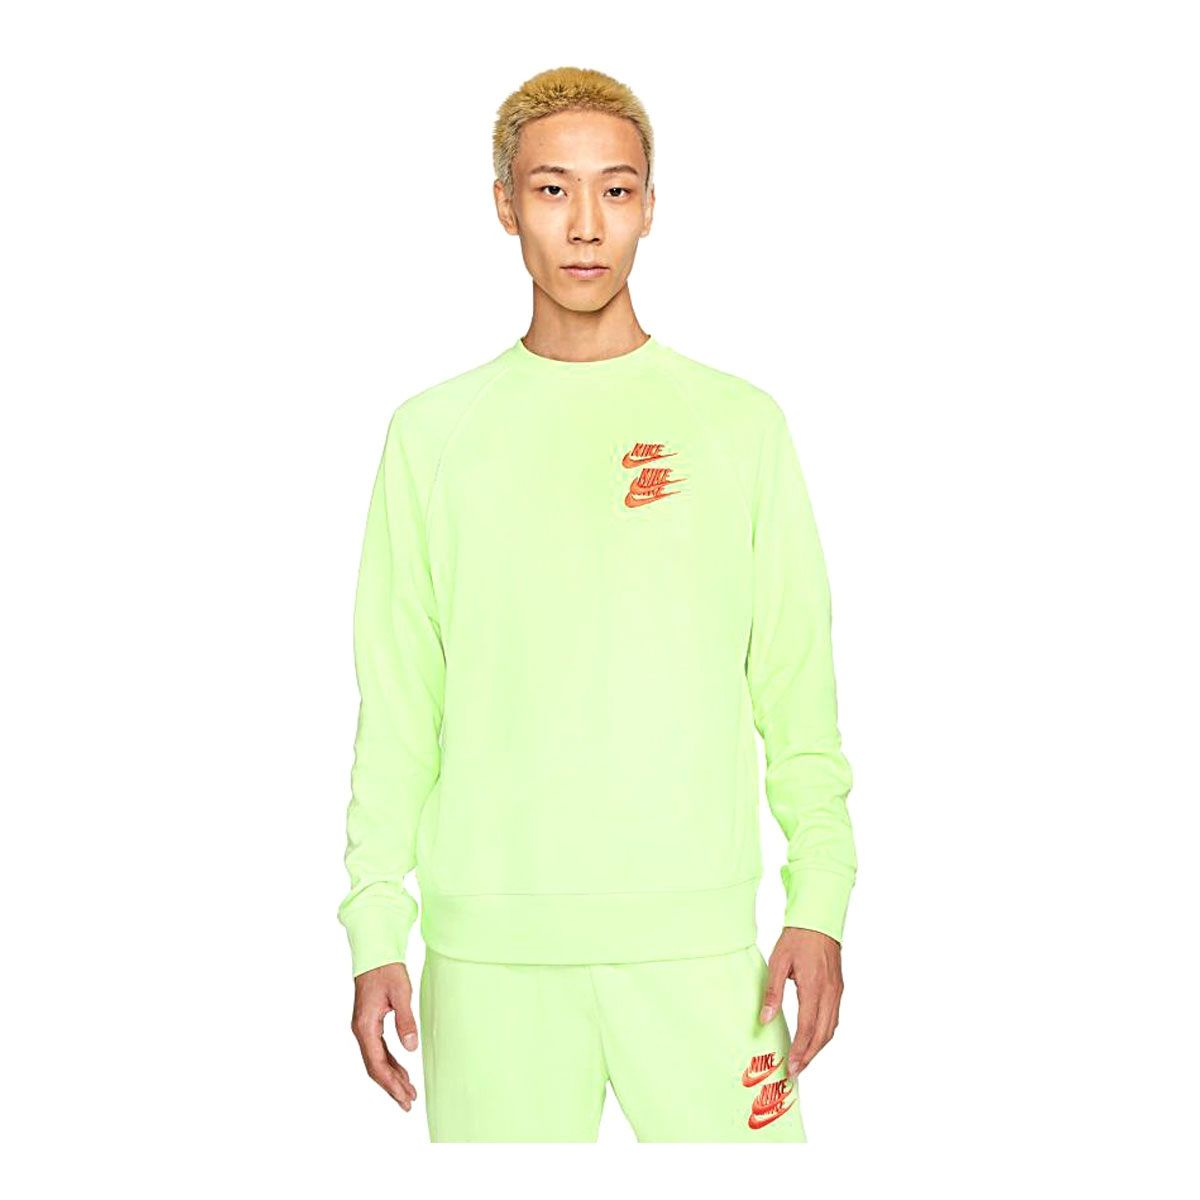 Nike Felpa World Tour Pack Swoosh Uomo Lime Arancione